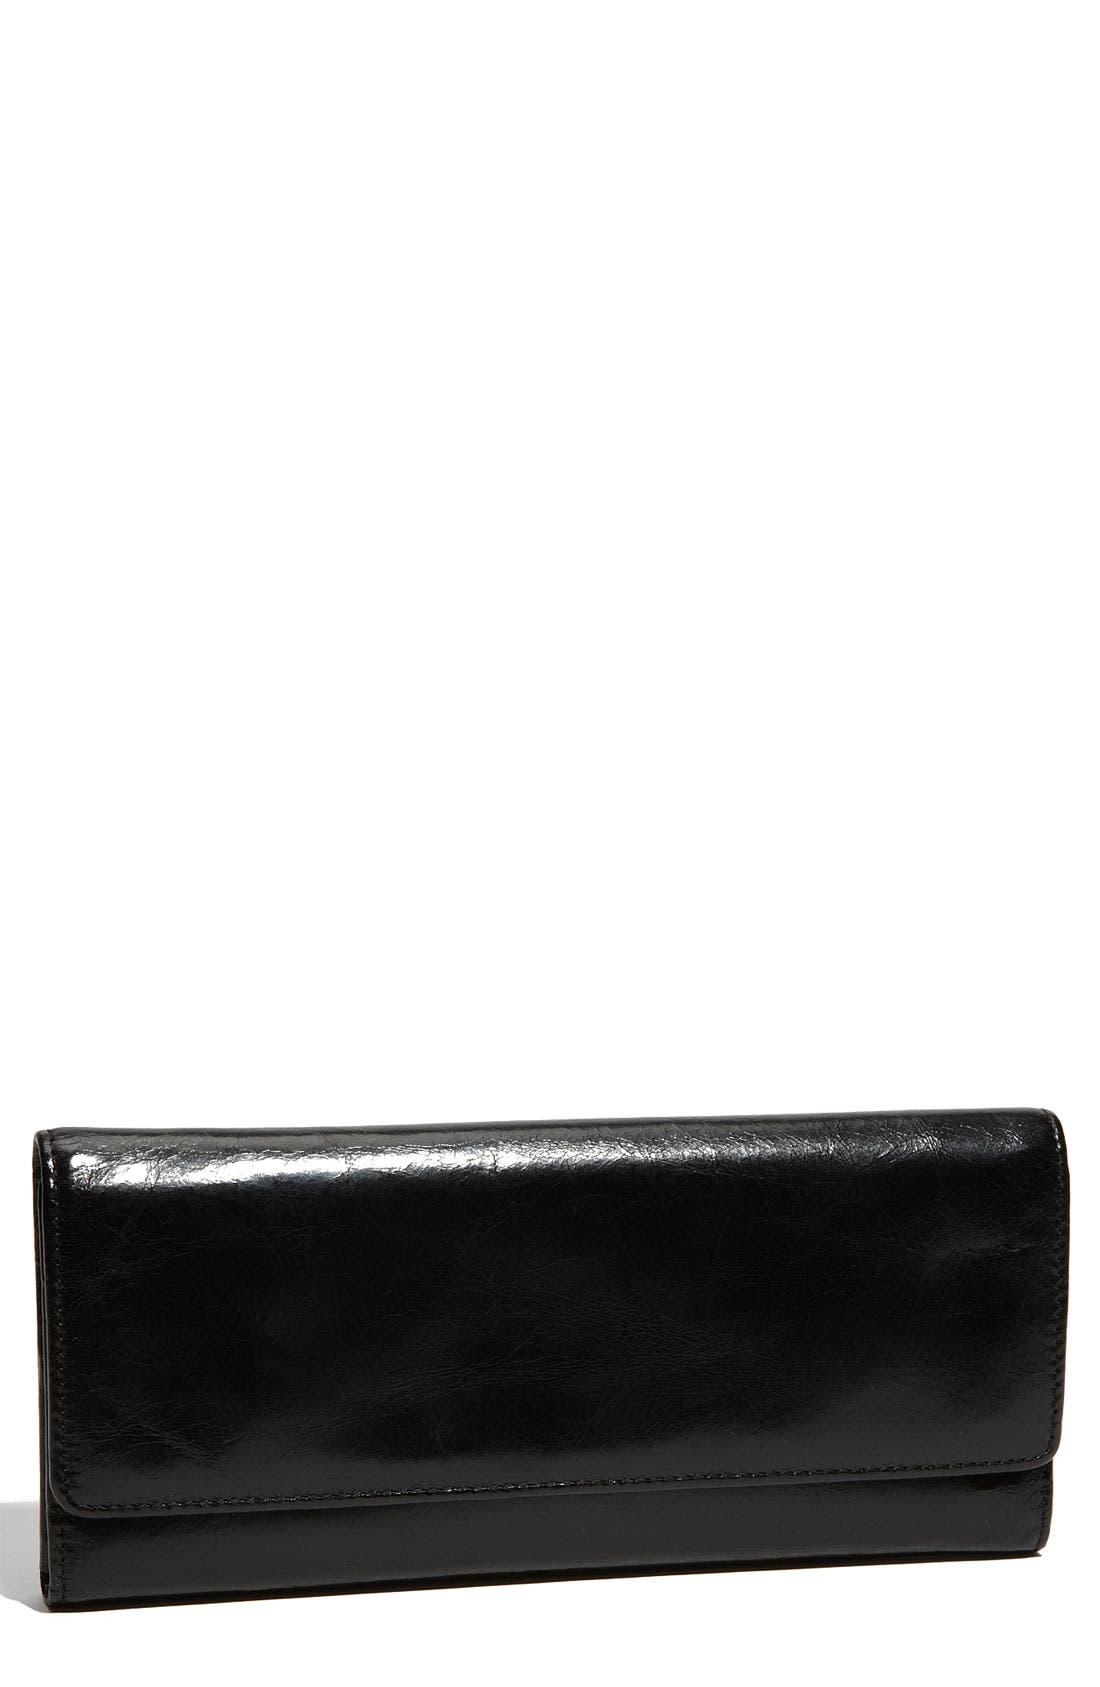 'Sadie' Leather Wallet,                             Main thumbnail 13, color,